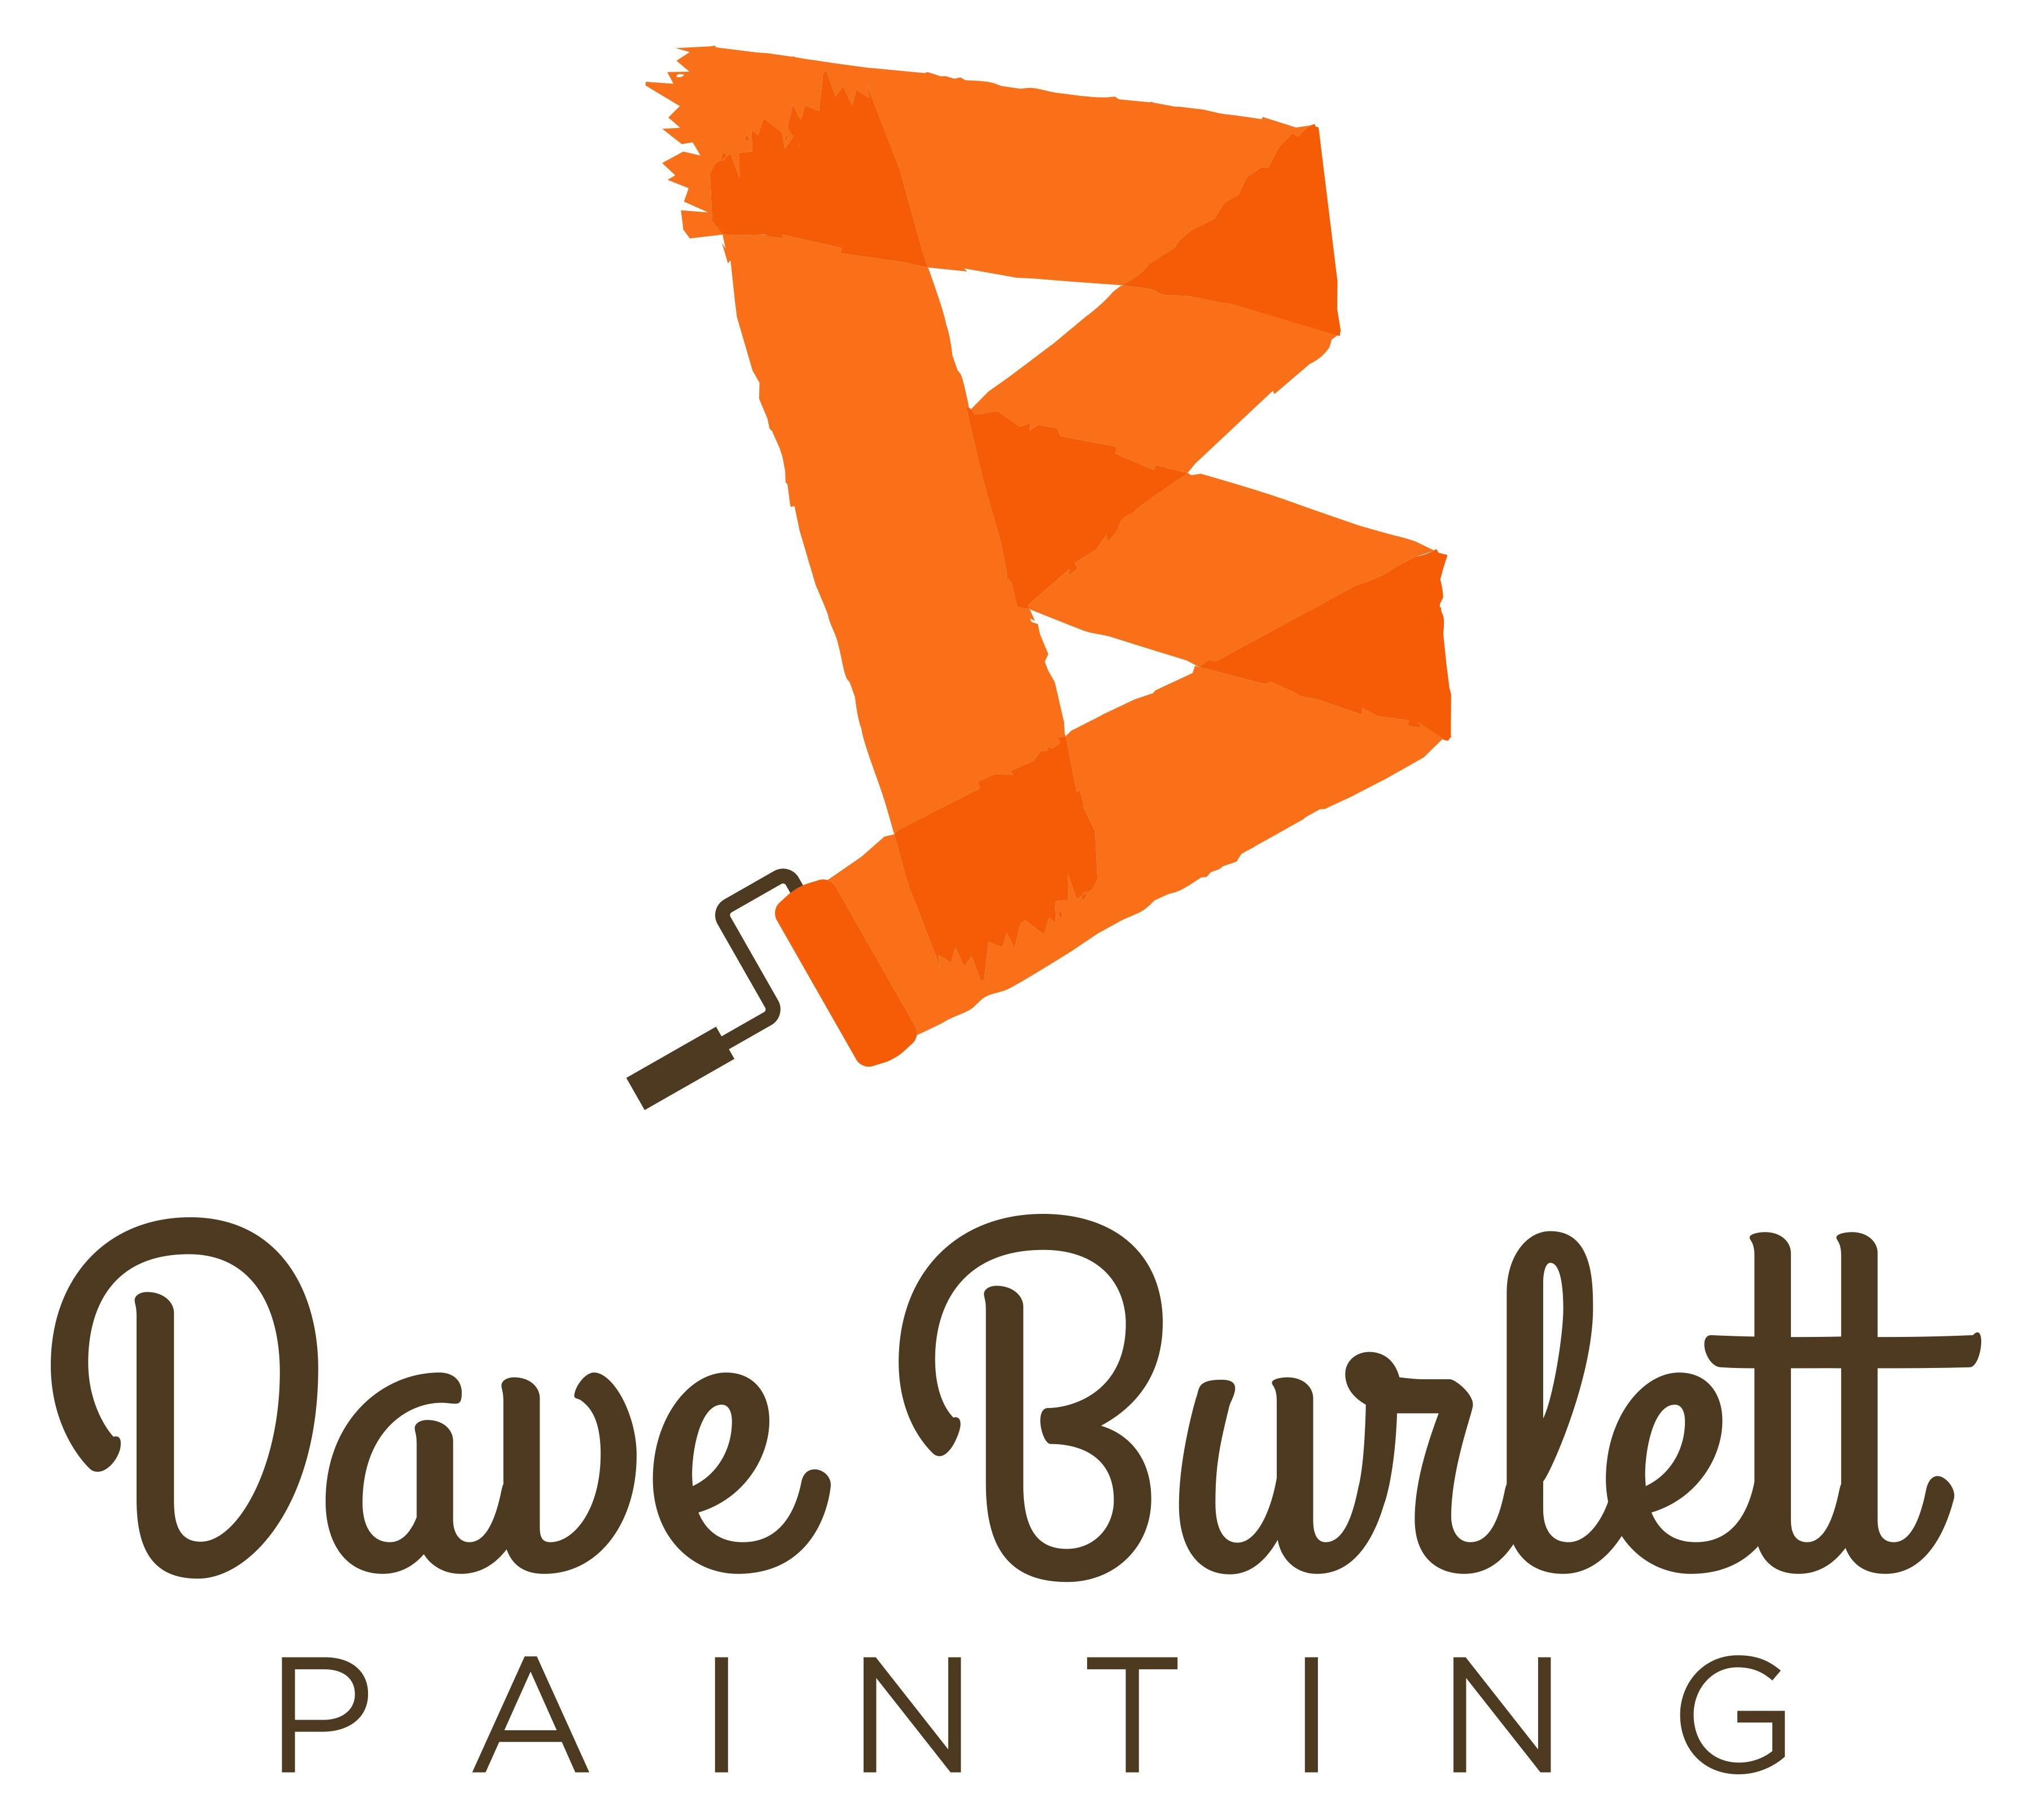 Burlett Painting Inc.